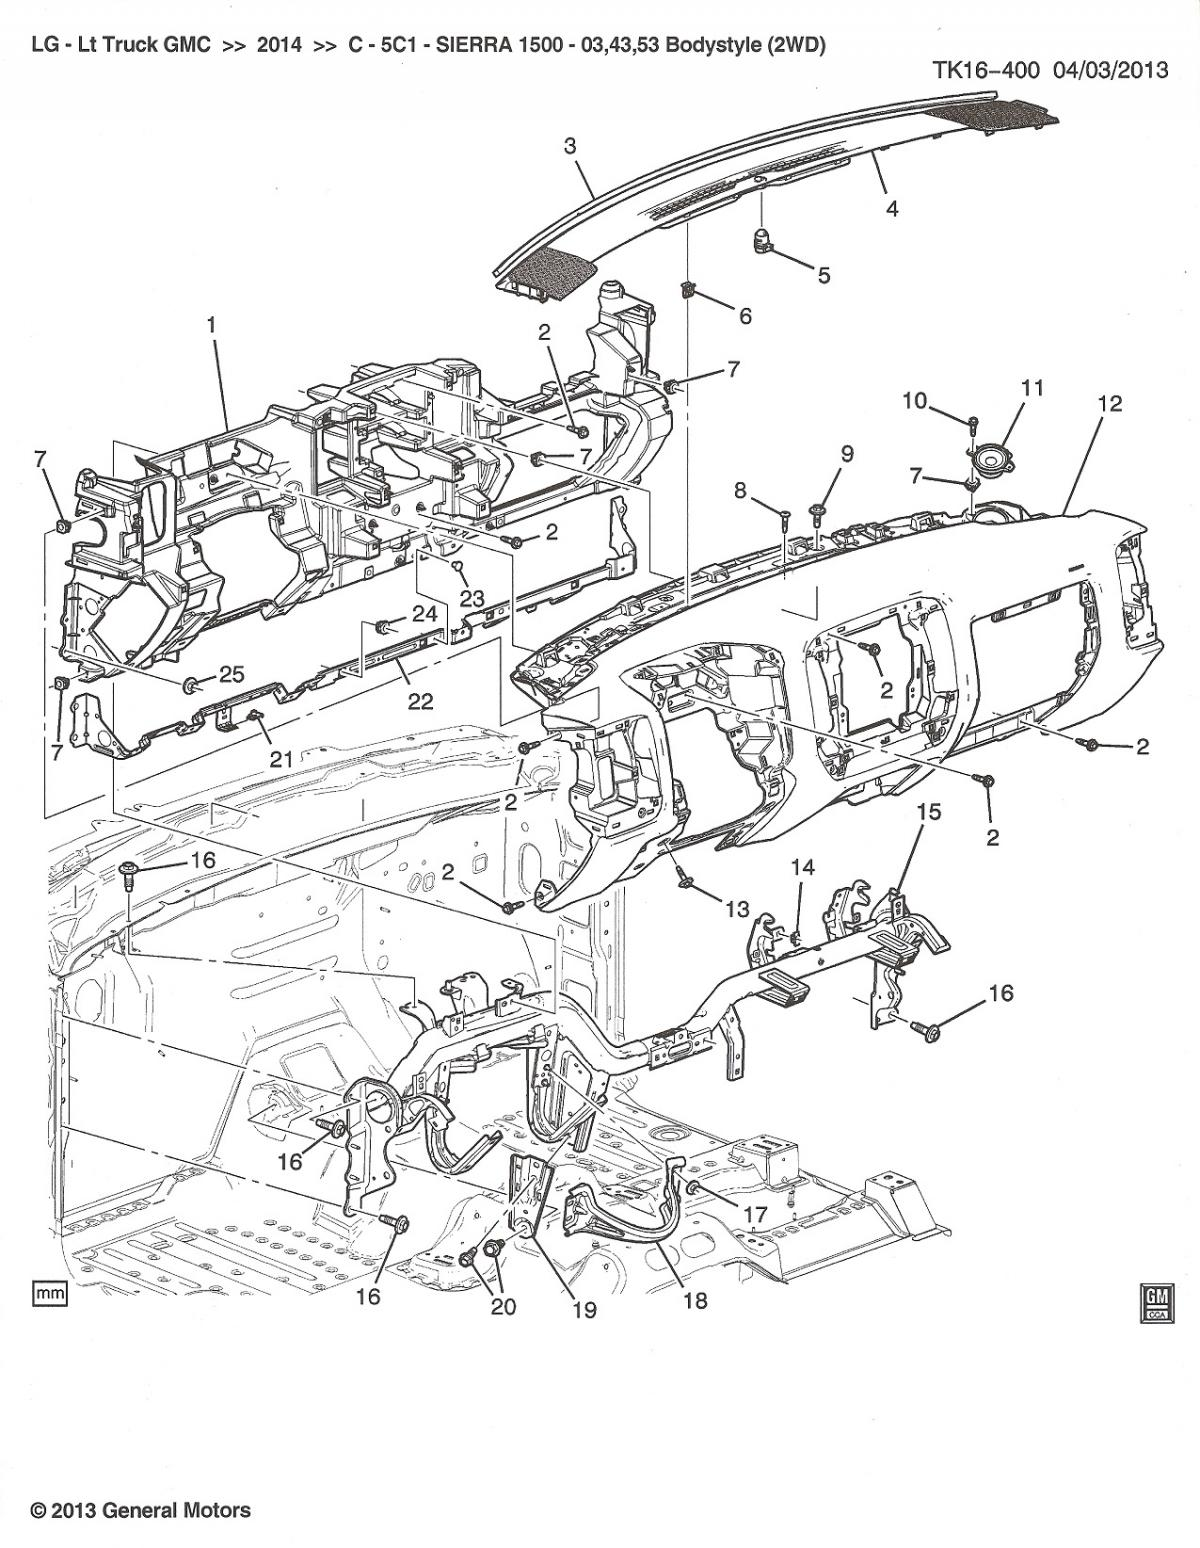 Chevy malibu brake proportioning valve diagram